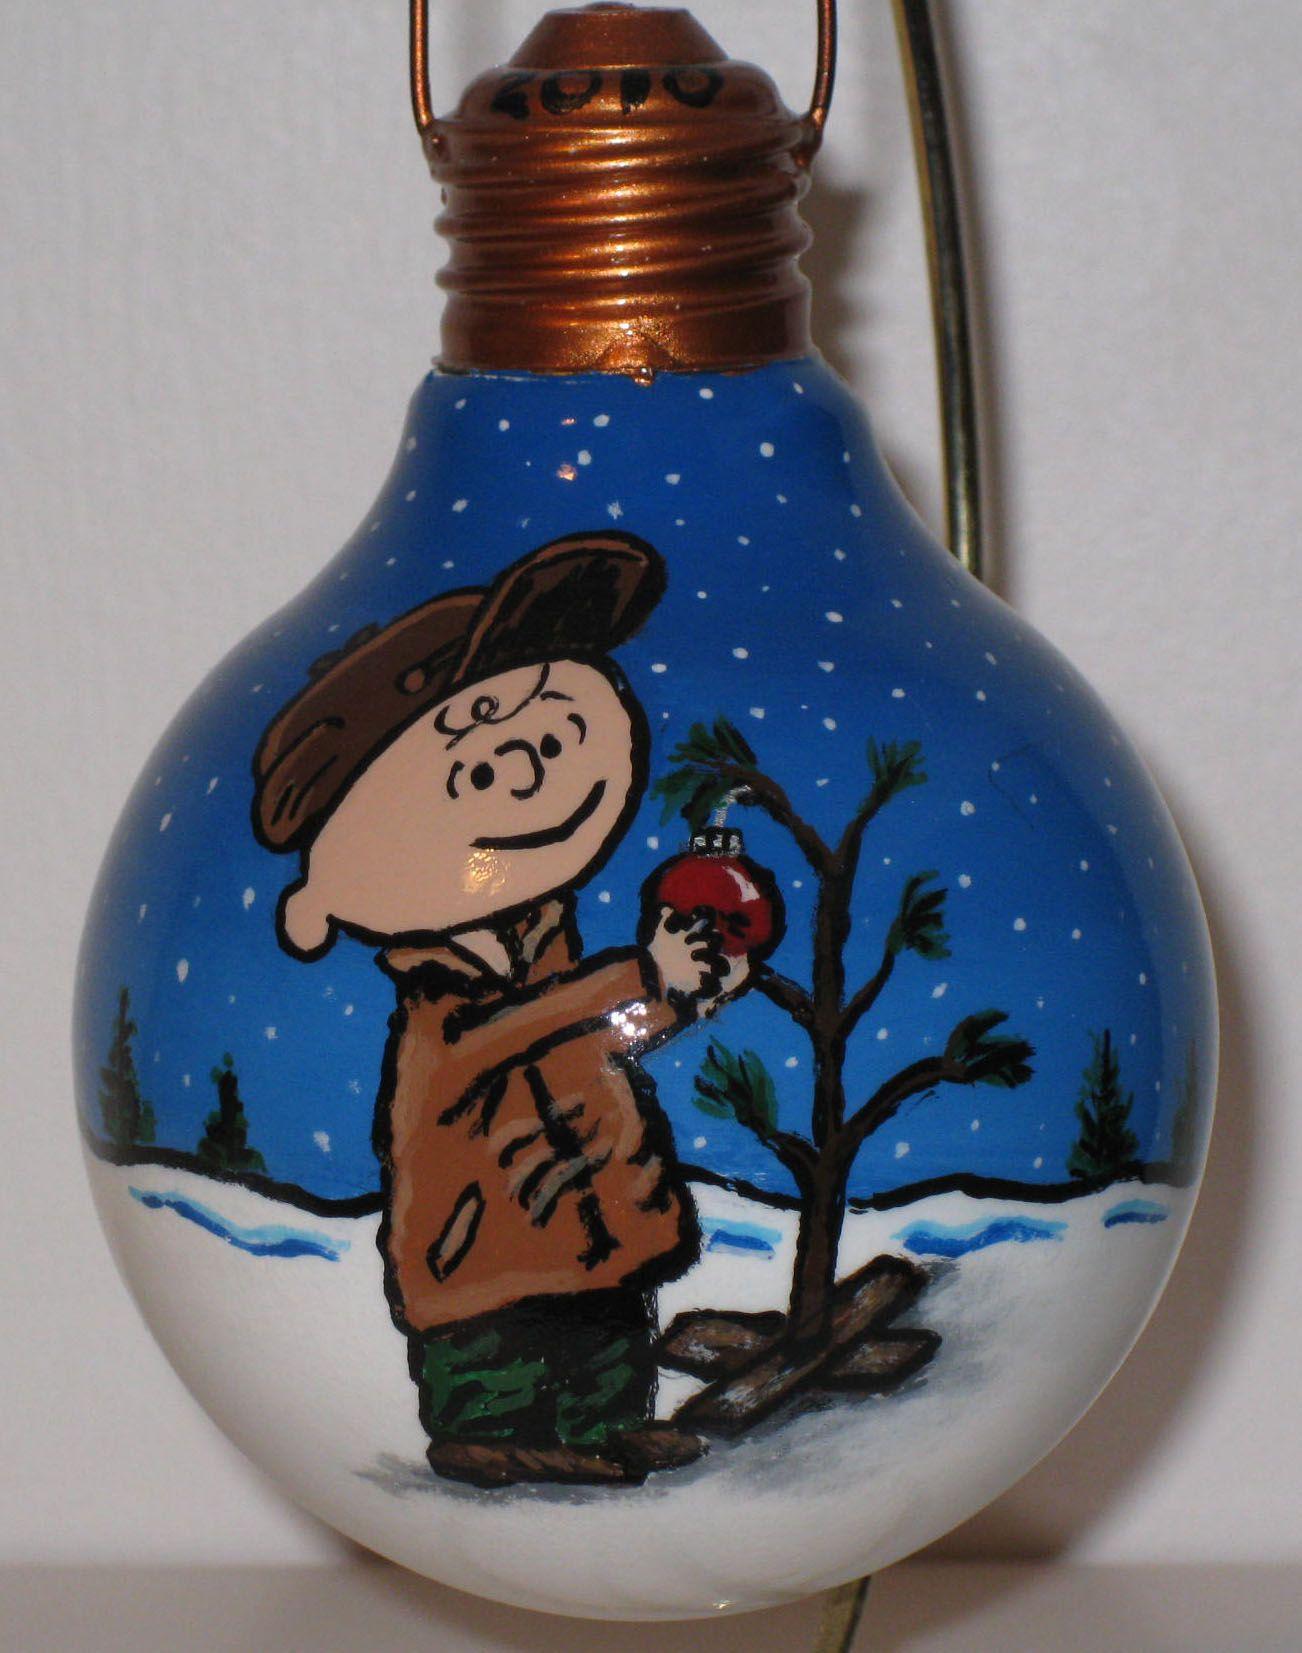 Snowman Lightbulb Ornament